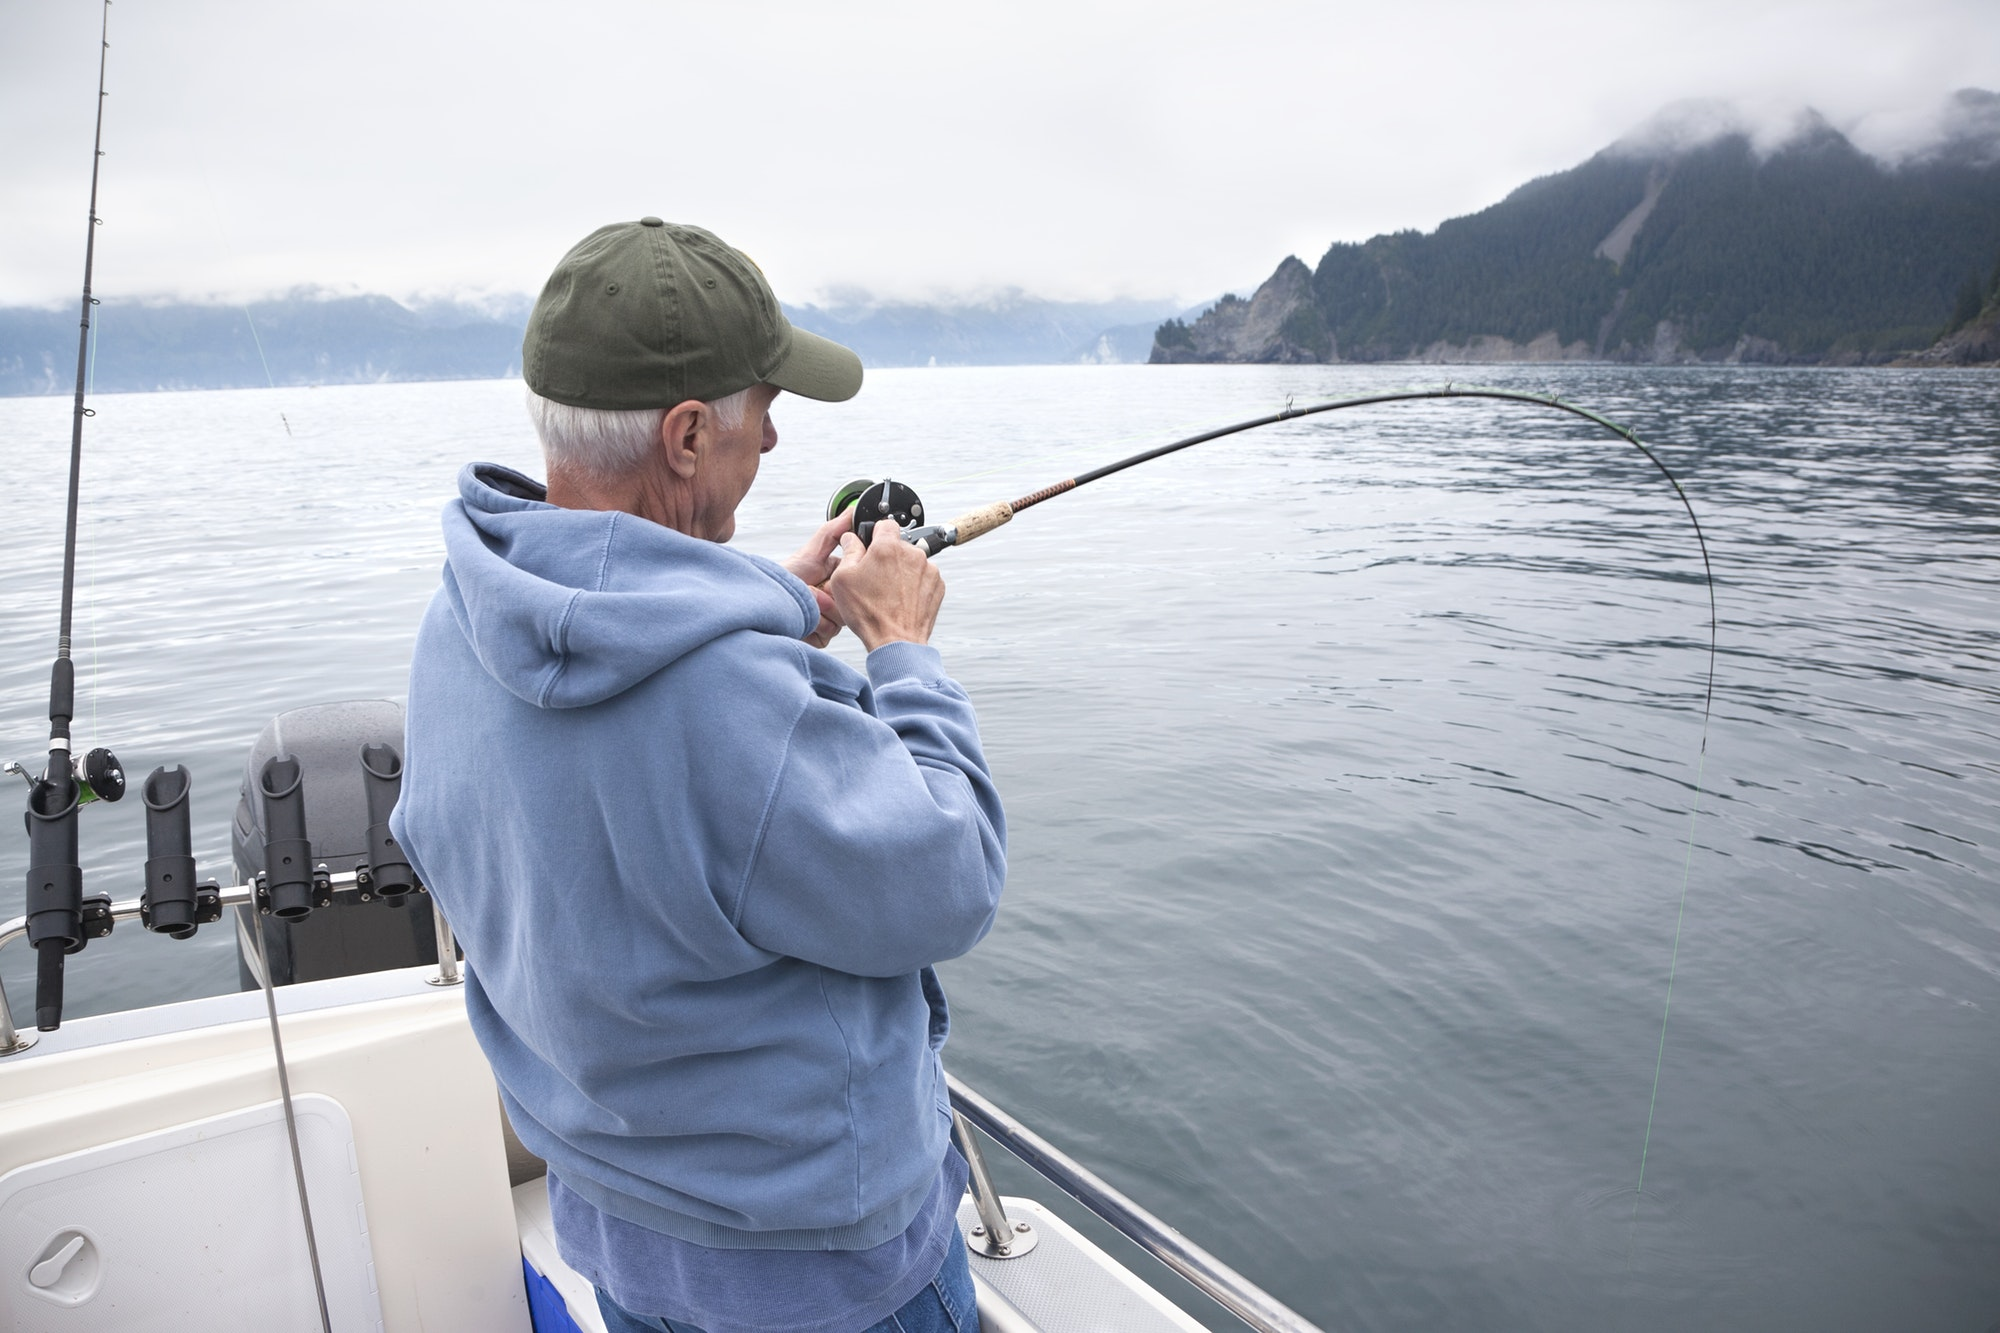 Senior fisherman catching a fish in the ocean near Seward, Alaska